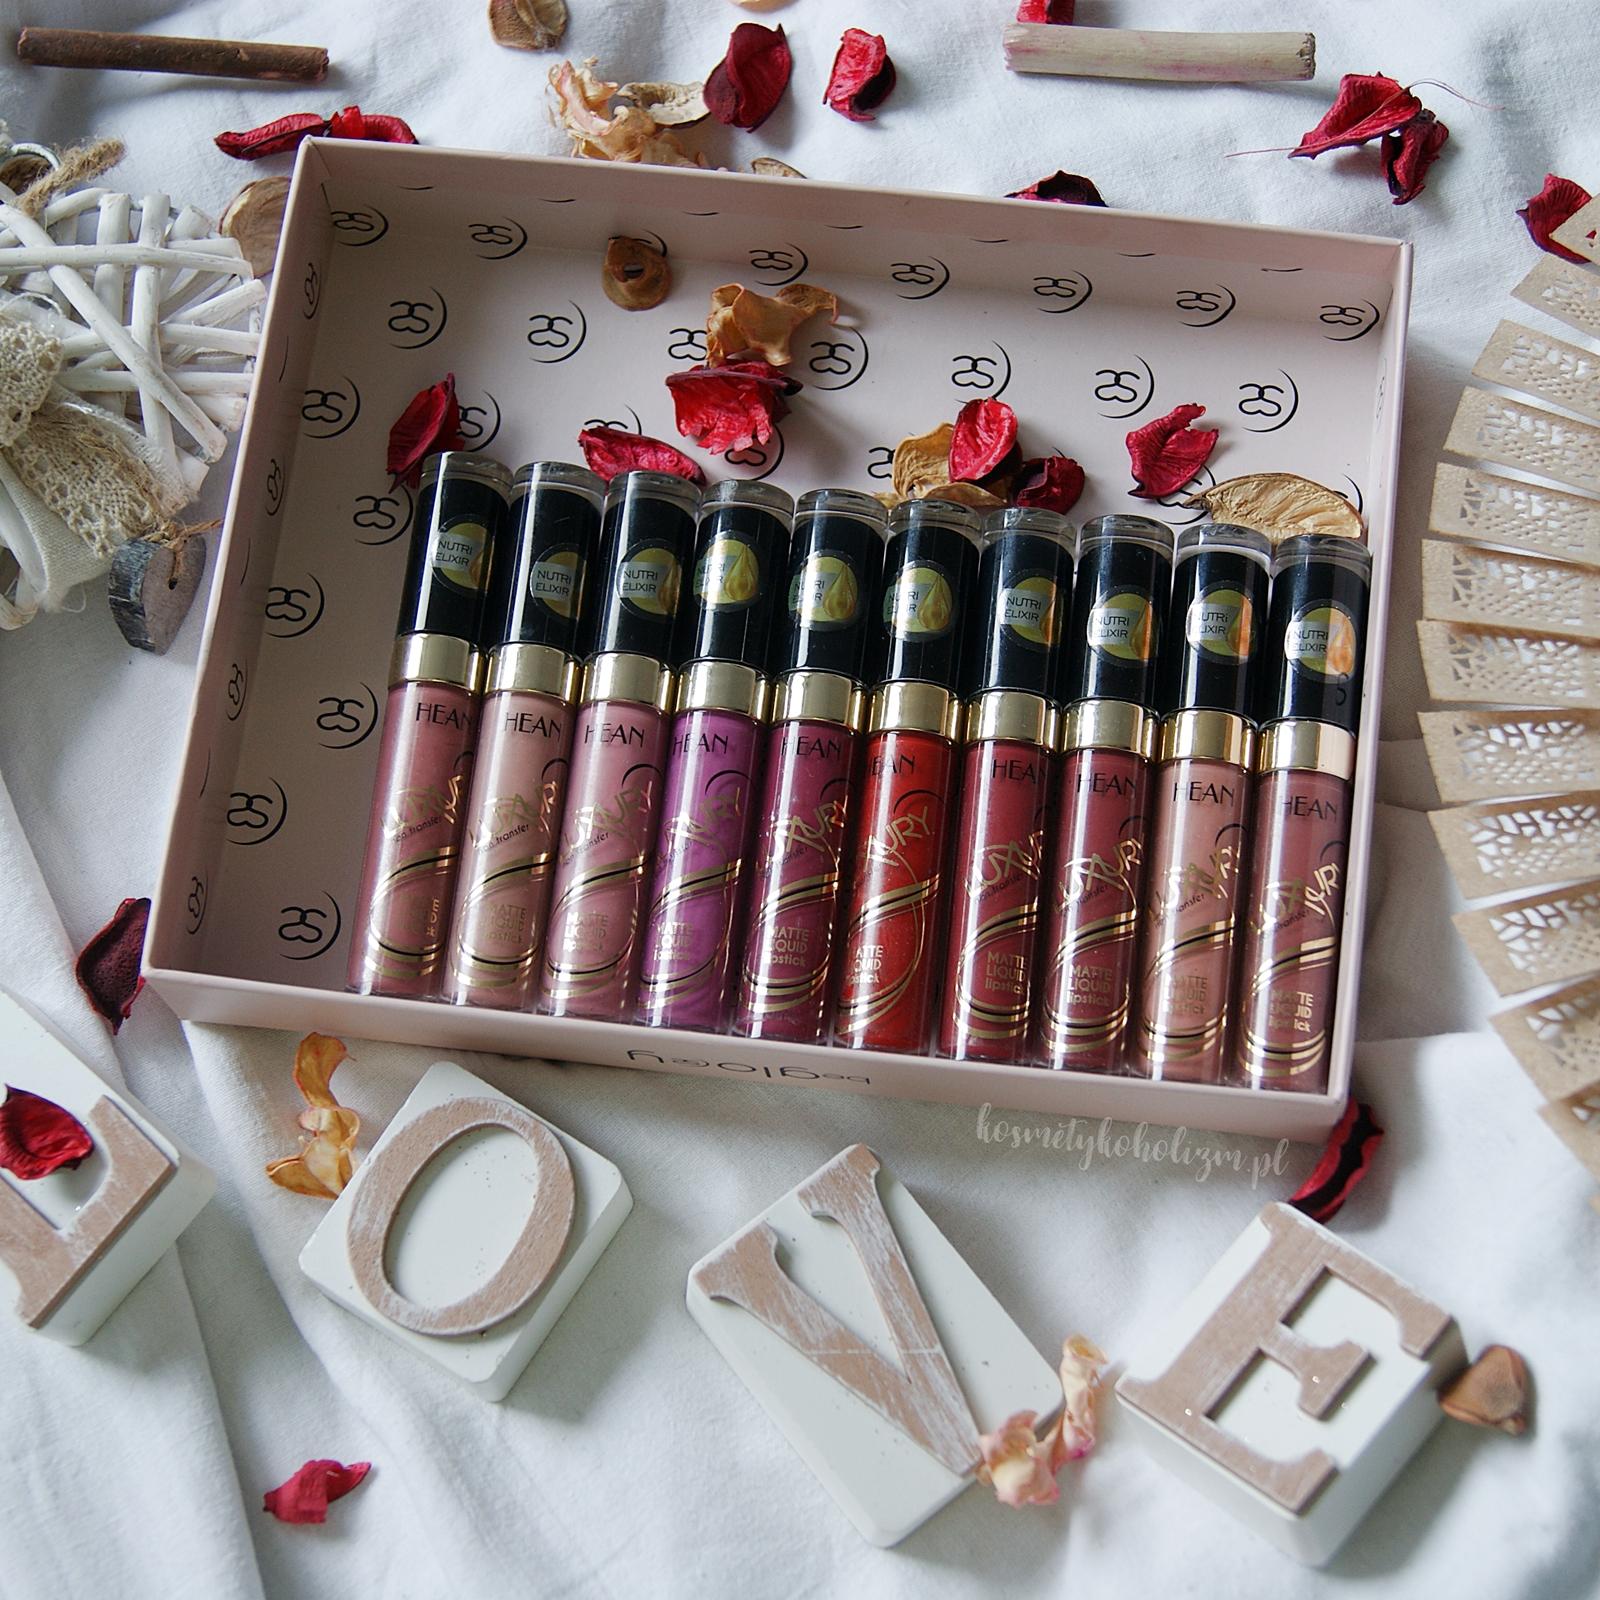 HEAN LUXURY Liquid Matte Lipstick | Przegląd kolorów | Swatche na ustach